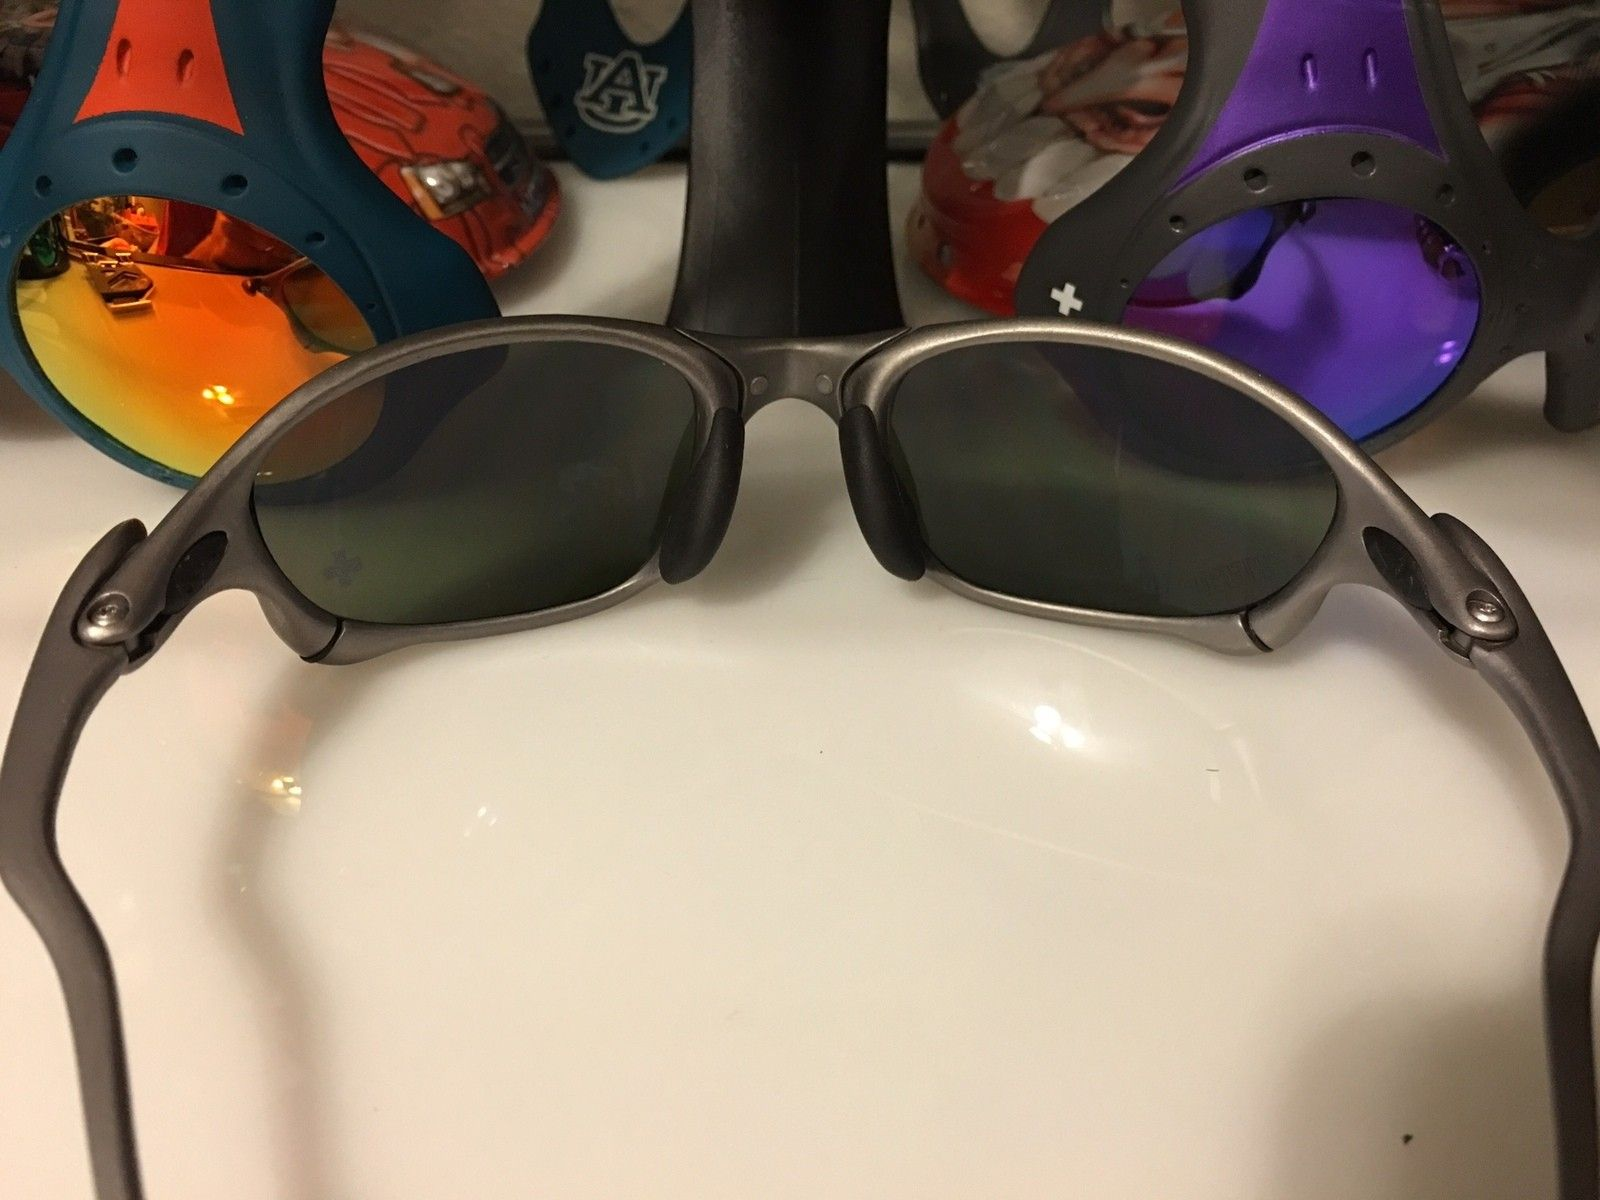 Two Pairs of XX (X-Man Plasma Refinish) with Lens Options - IMG_8449.JPG